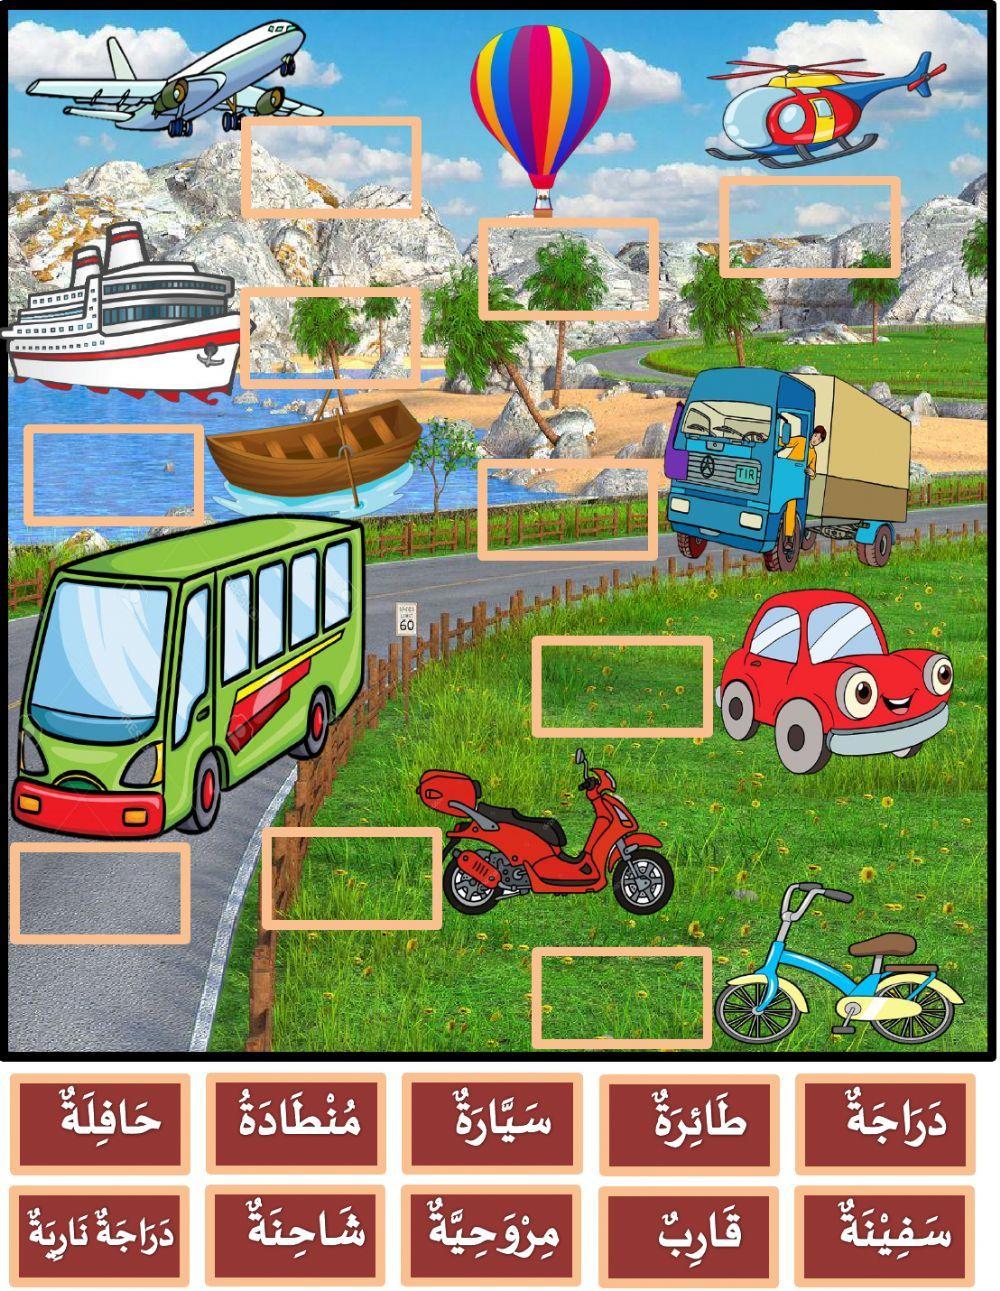 Kenderaan Online Worksheet For Darjah 3 You Can Do The Exercises Online Or Download The Worksheet As Pdf Arabic Alphabet For Kids Worksheets Alphabet For Kids